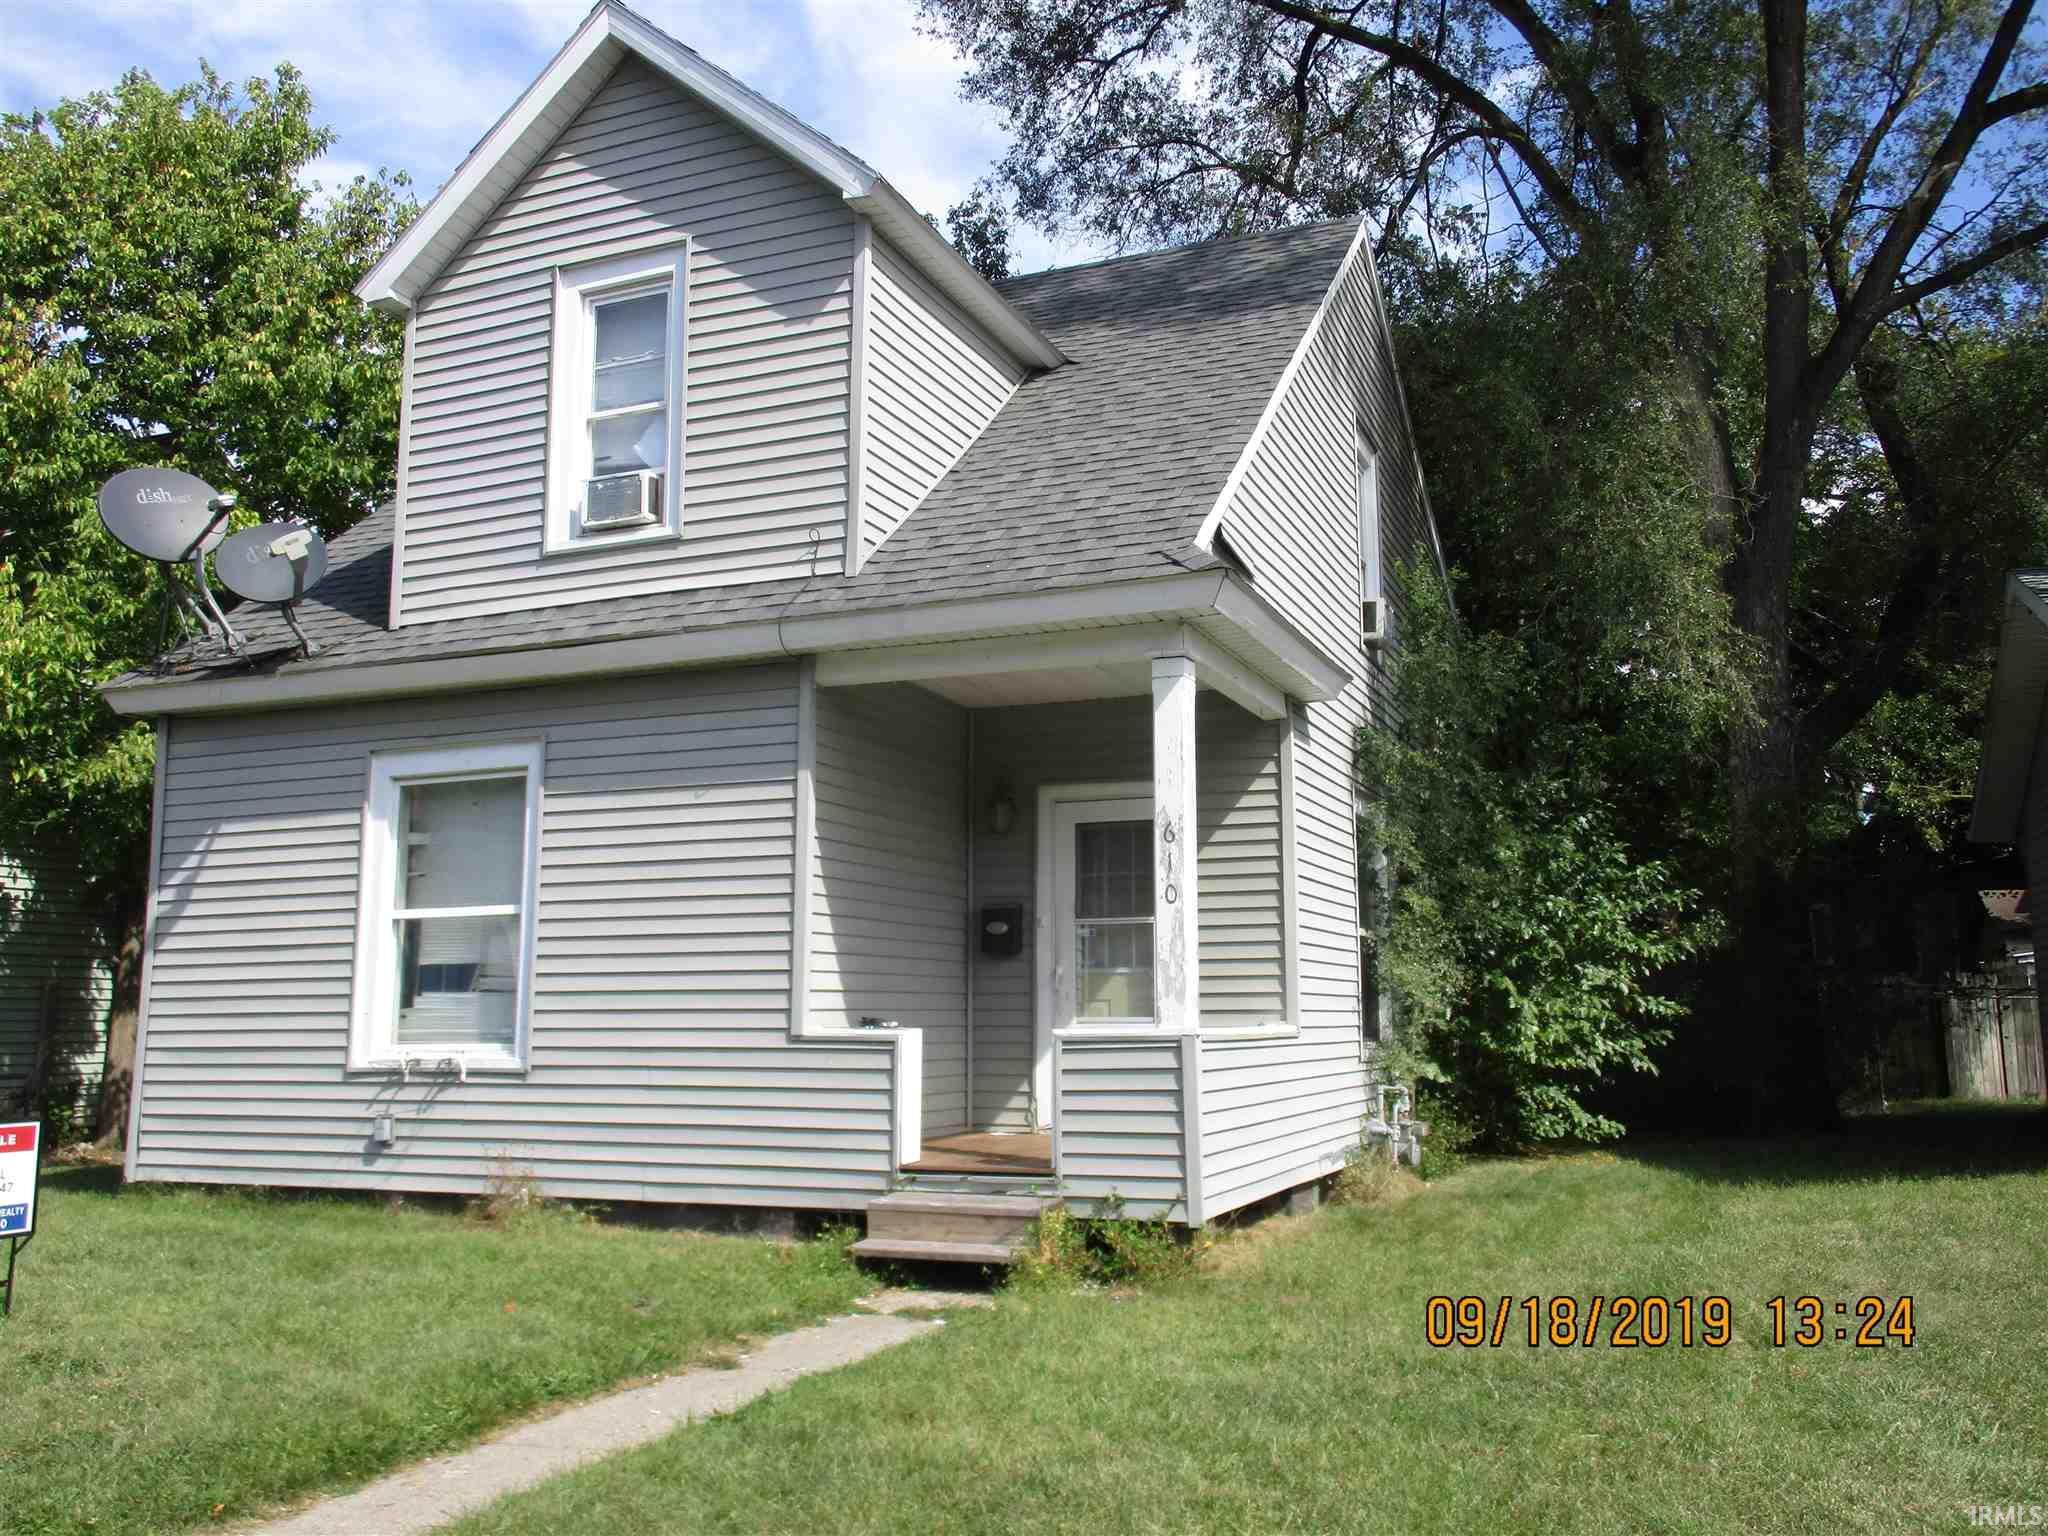 610 N Michigan Elkhart, IN 46514